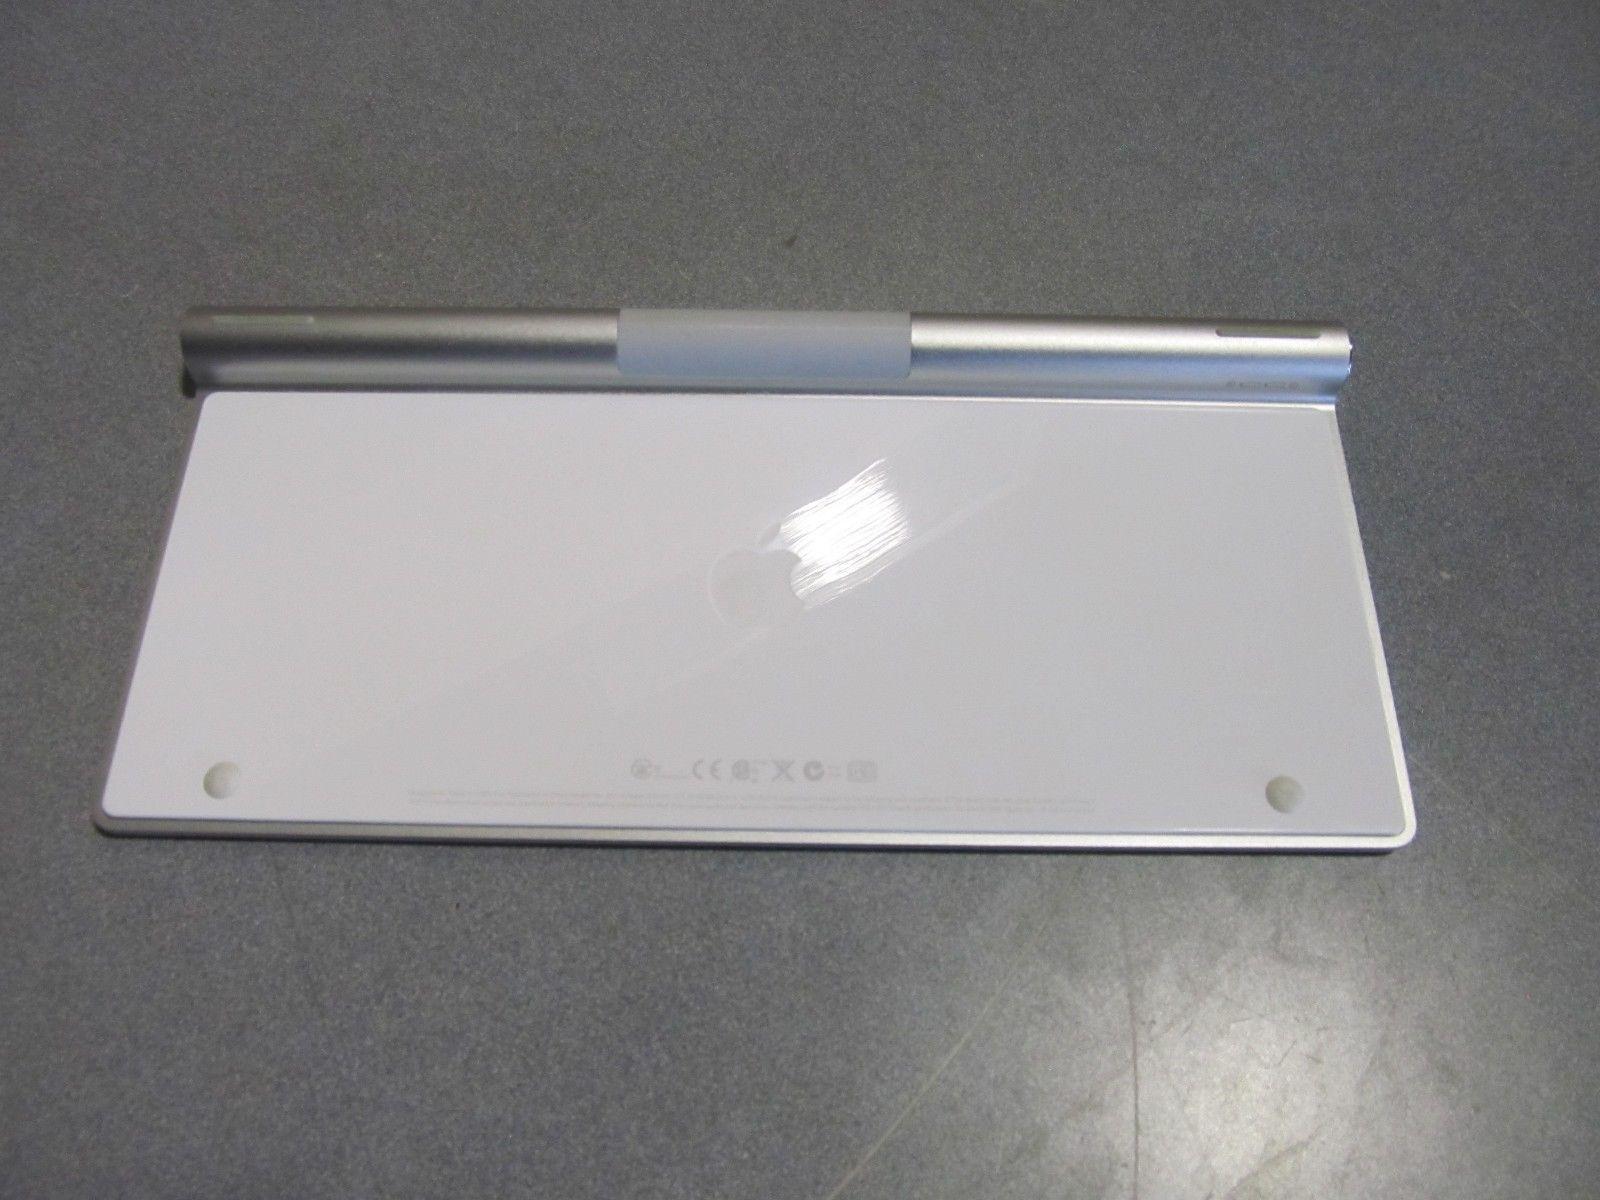 6ac96aea494 OEM apple wireless keyboard model A1314 and 50 similar items